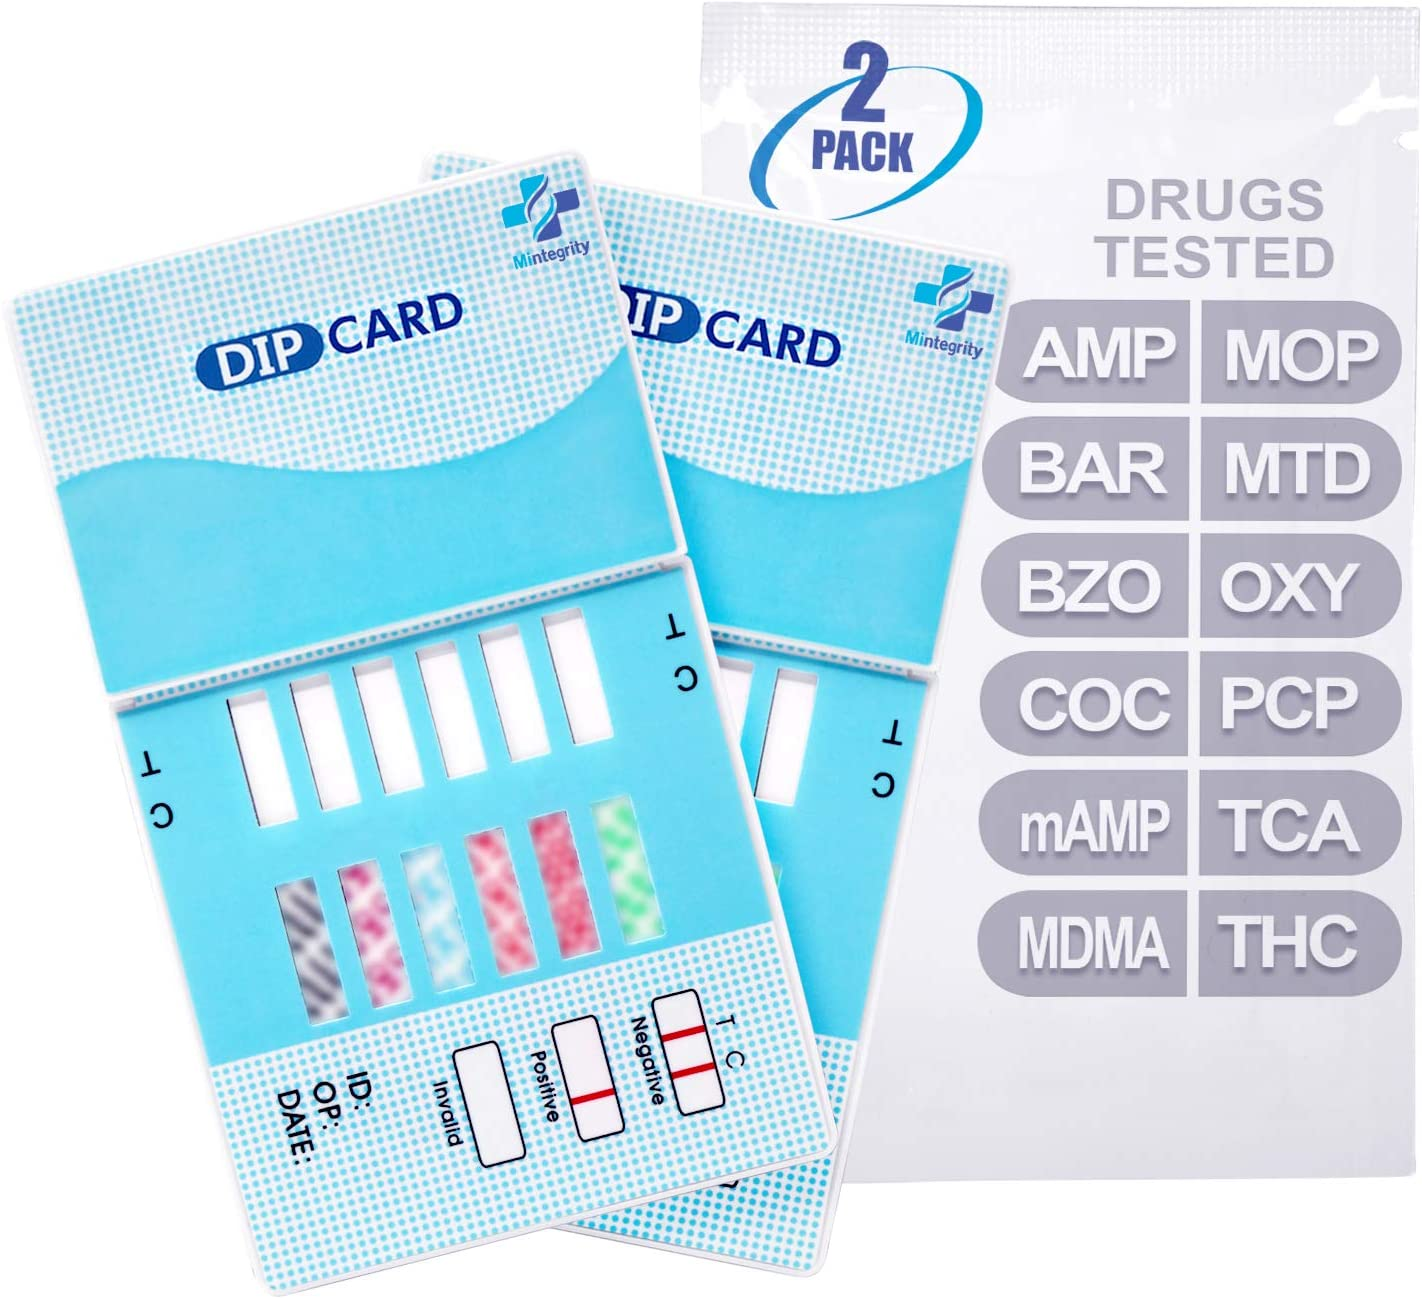 MiCare 2pk - 12-Panel Urine Drug Test mA BZO BAR New Shipping Free Shipping AMP latest COC Card